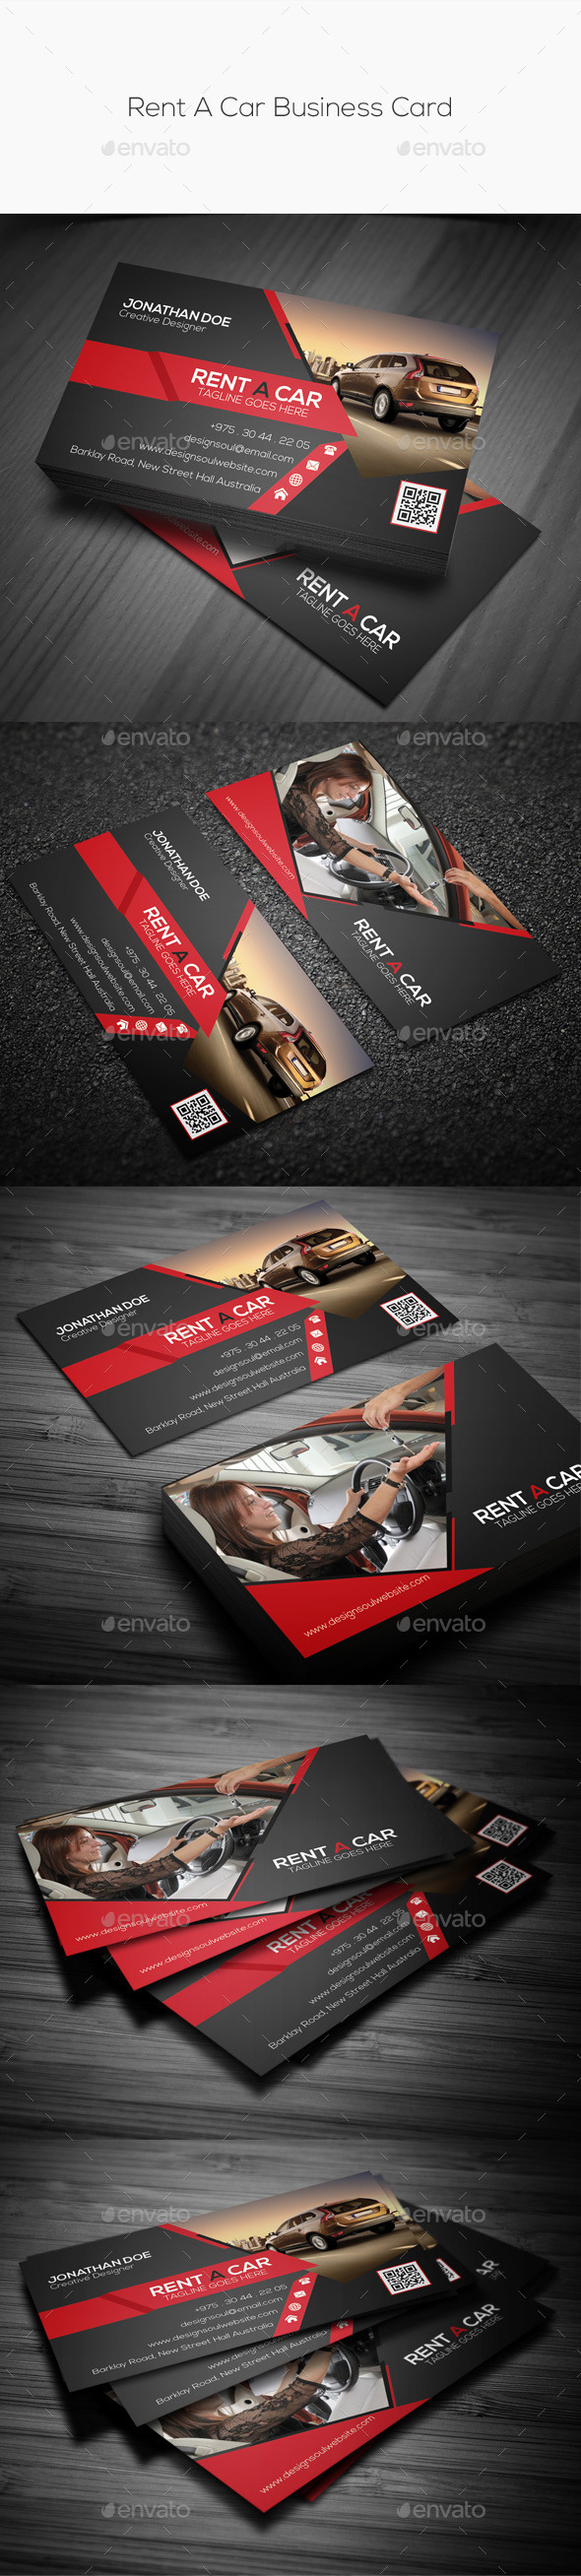 GraphicRiver Rent A Car Business Card 10069504